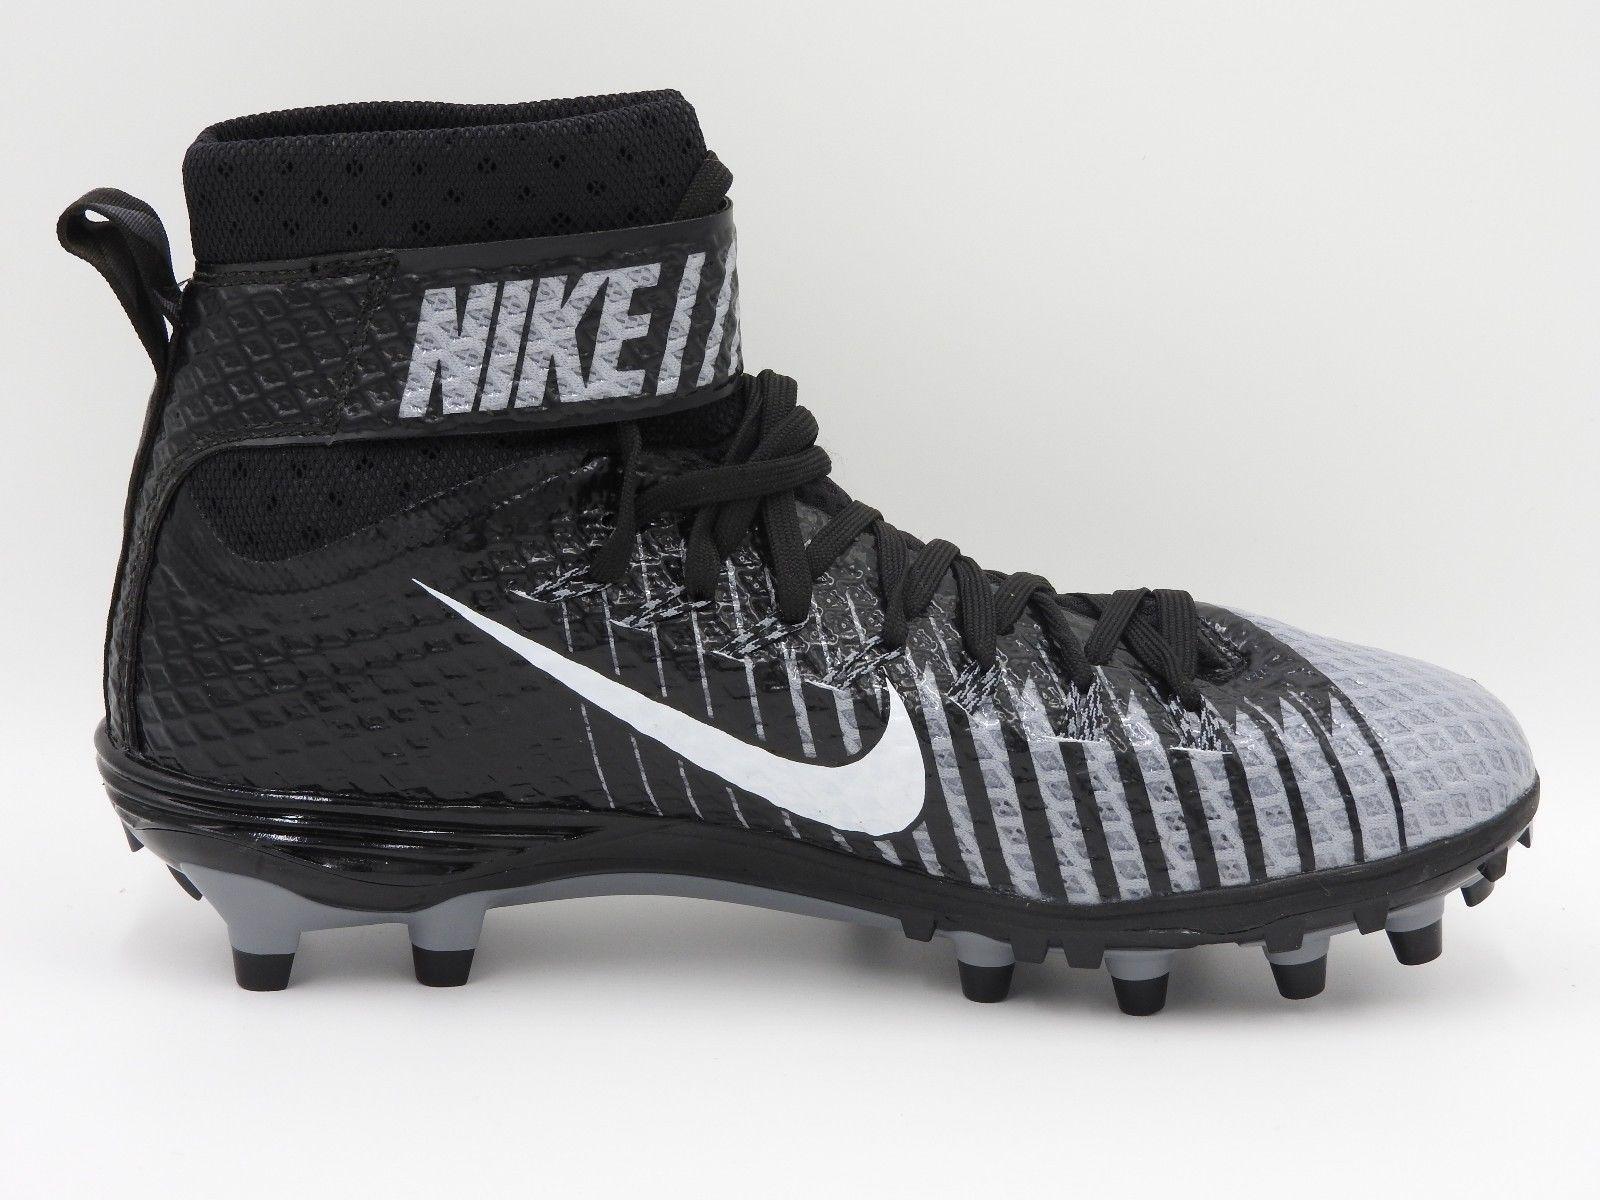 newest 9bfa1 b4823 Nike Force Lunarbeast Elite TD Football Cleats 779422-010,Gray Black,Men s  11